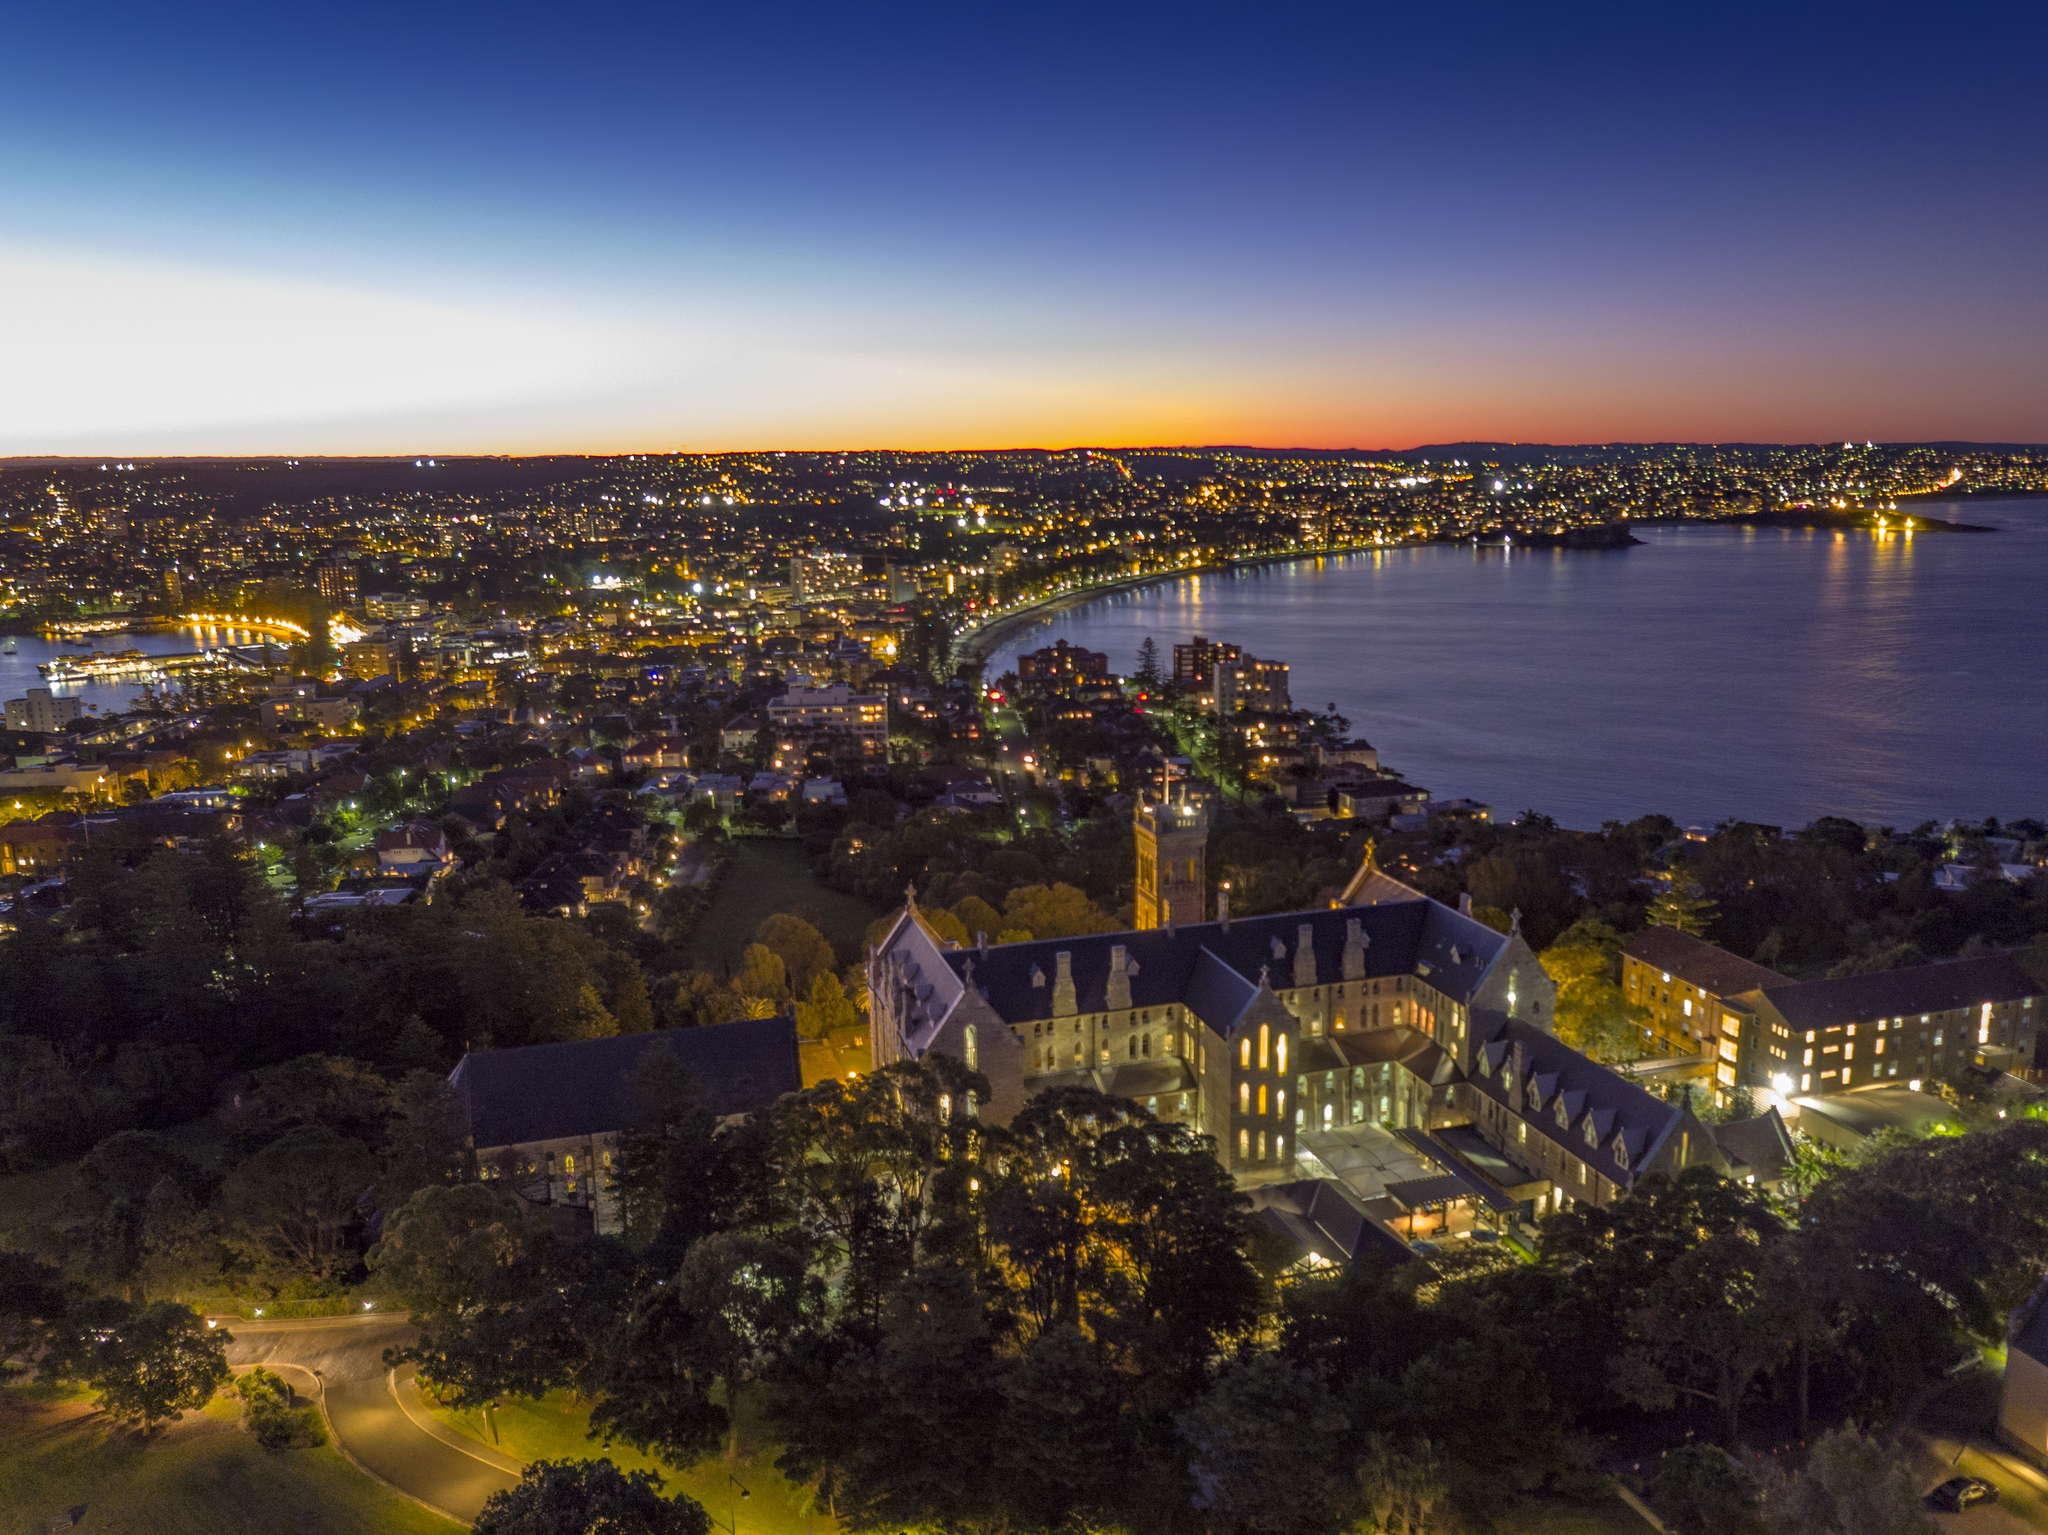 International_College_of_Management_Sydney_7_160701_ICMSMANLY-268